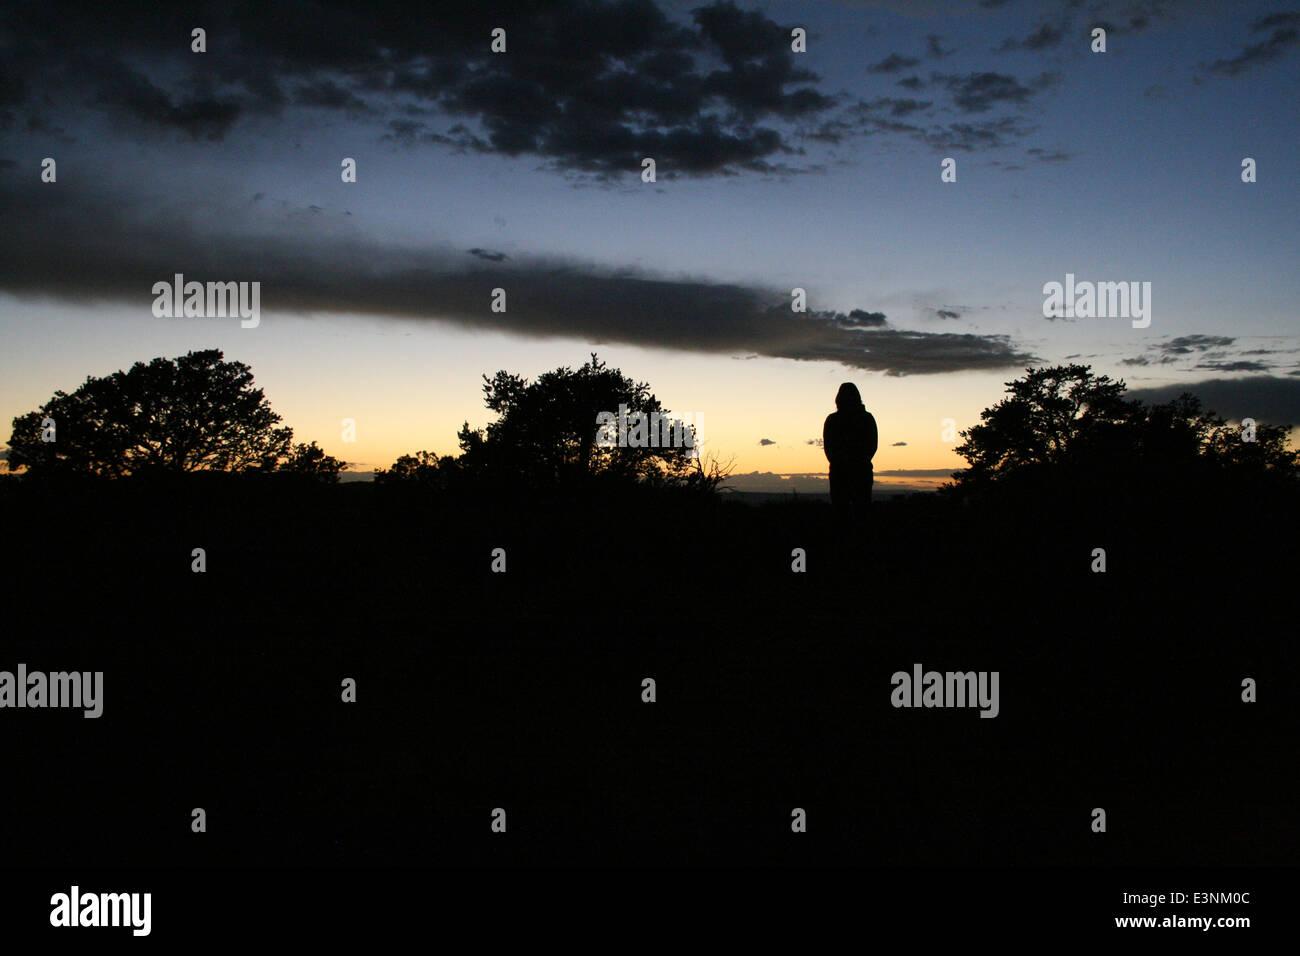 Silhouette Frau - Stock Image